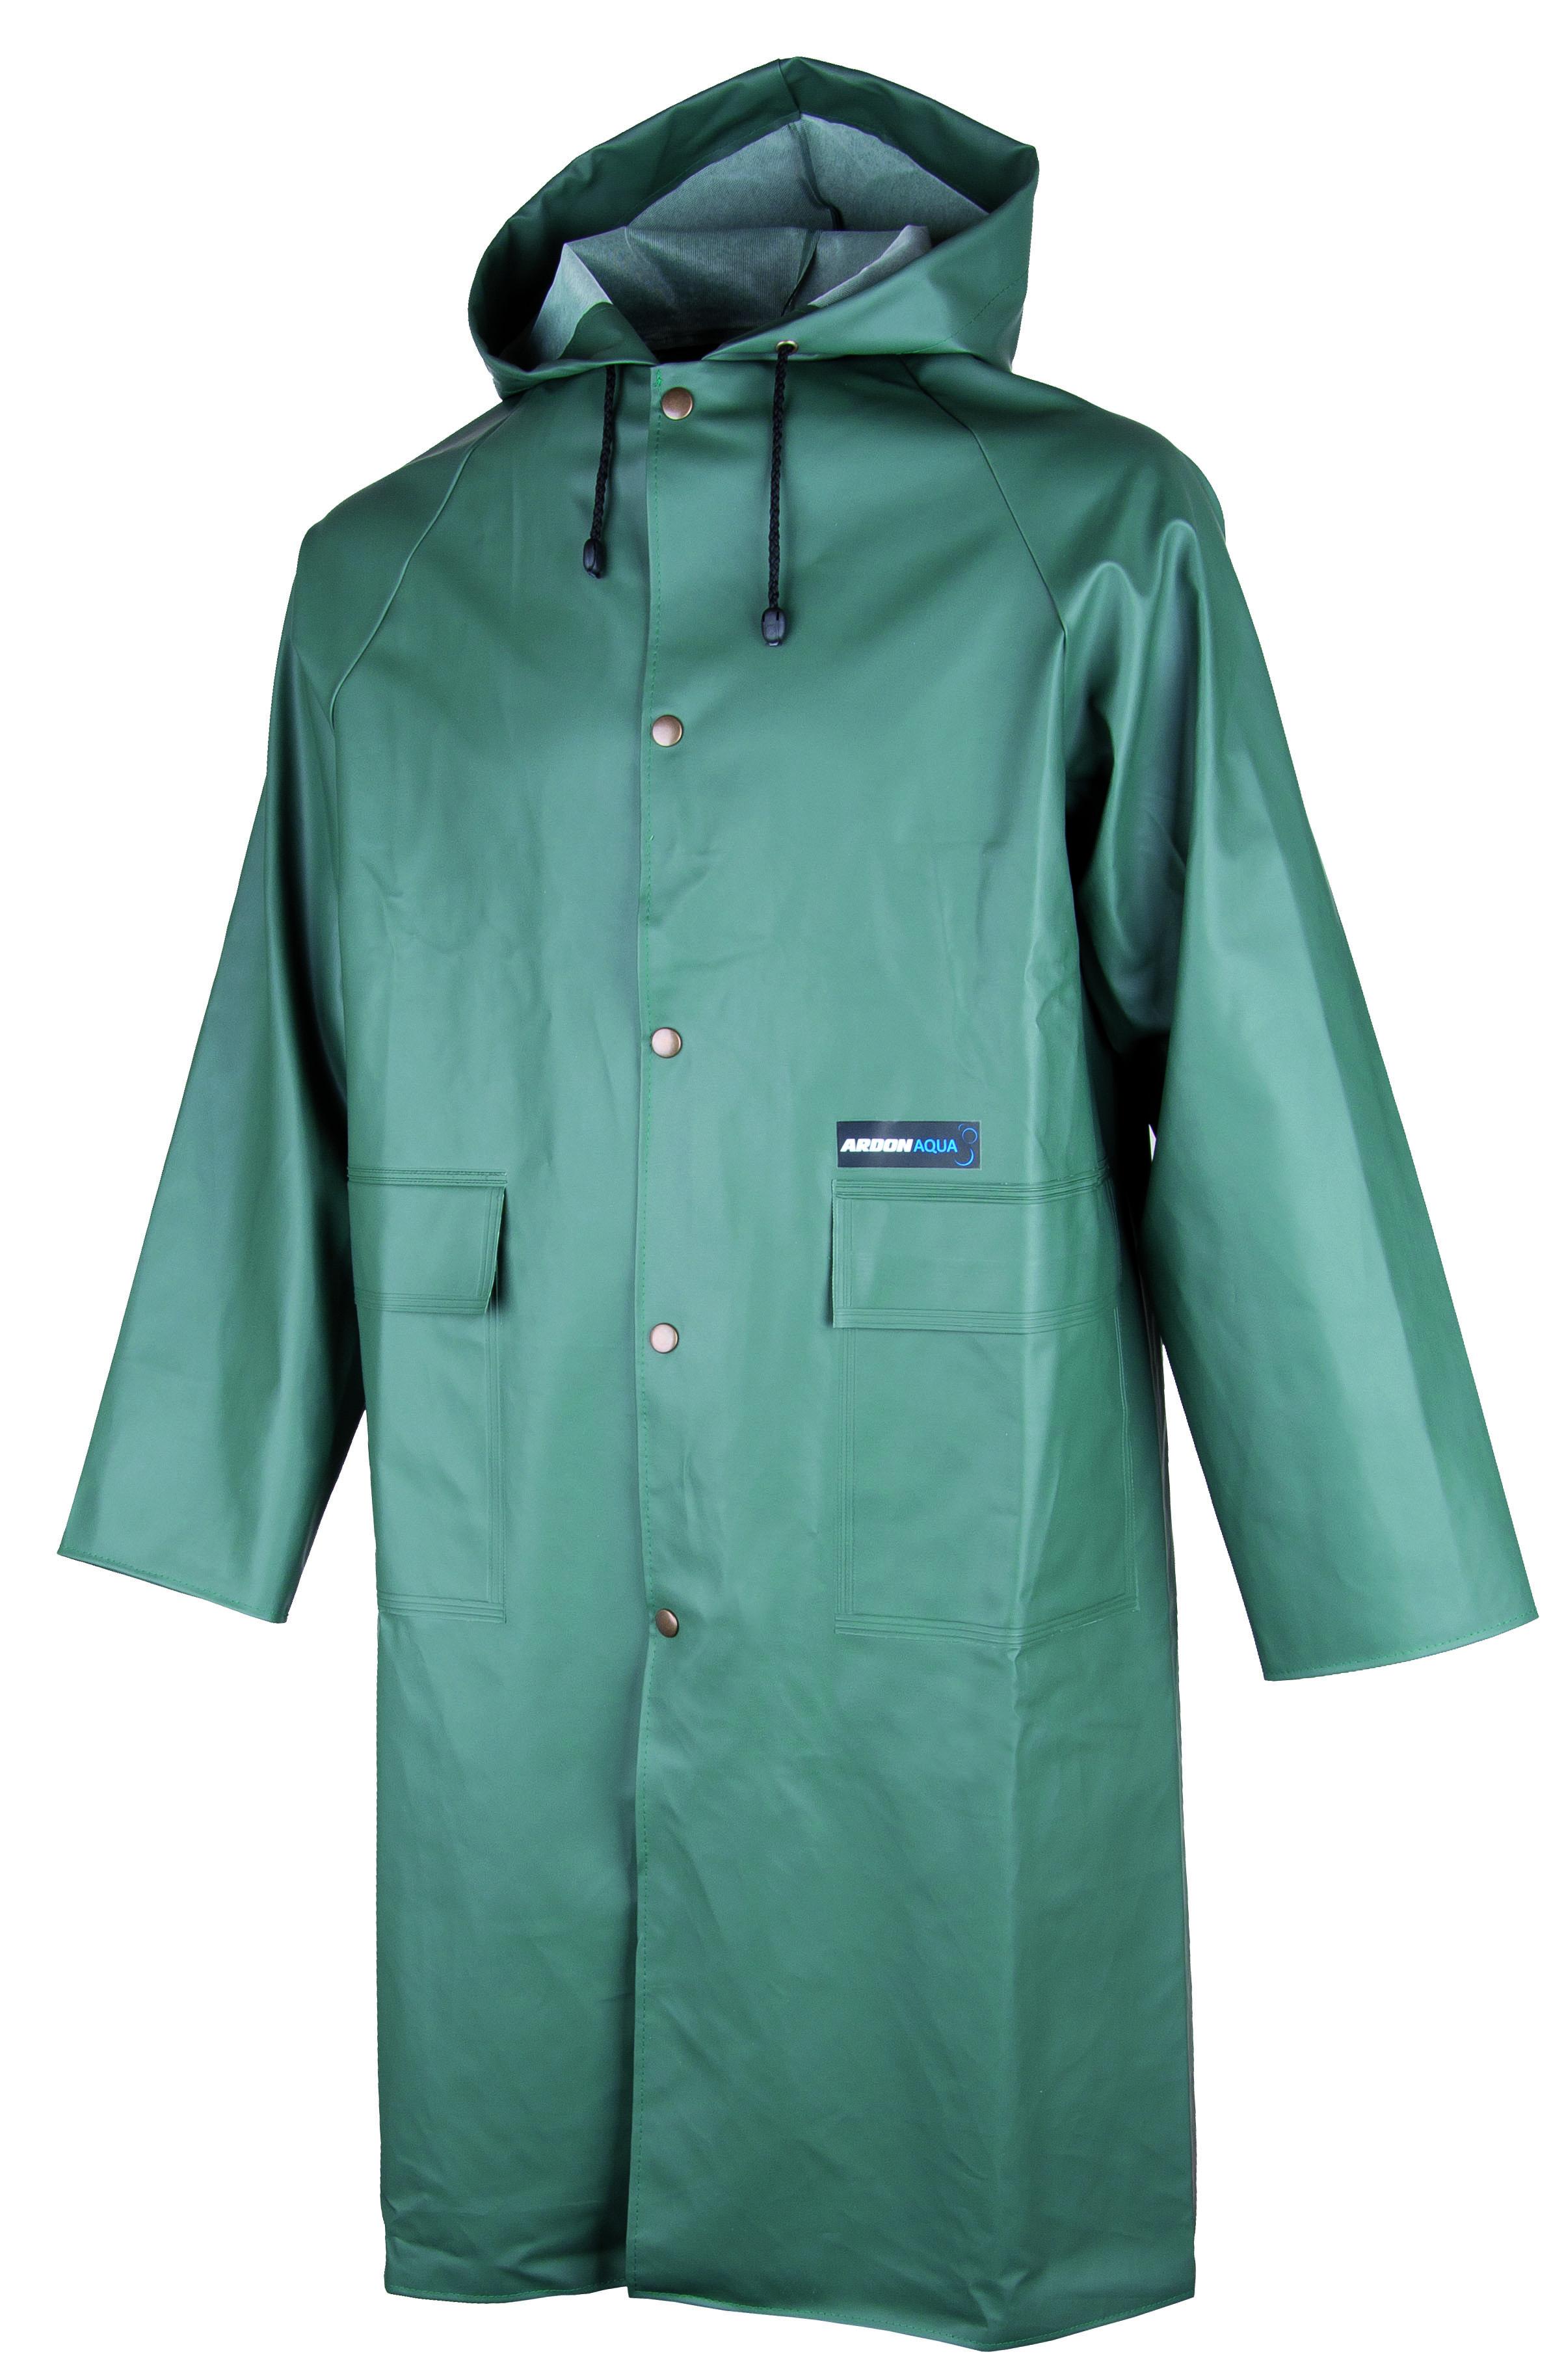 Plášť ARDON AQUA 106 zelený L